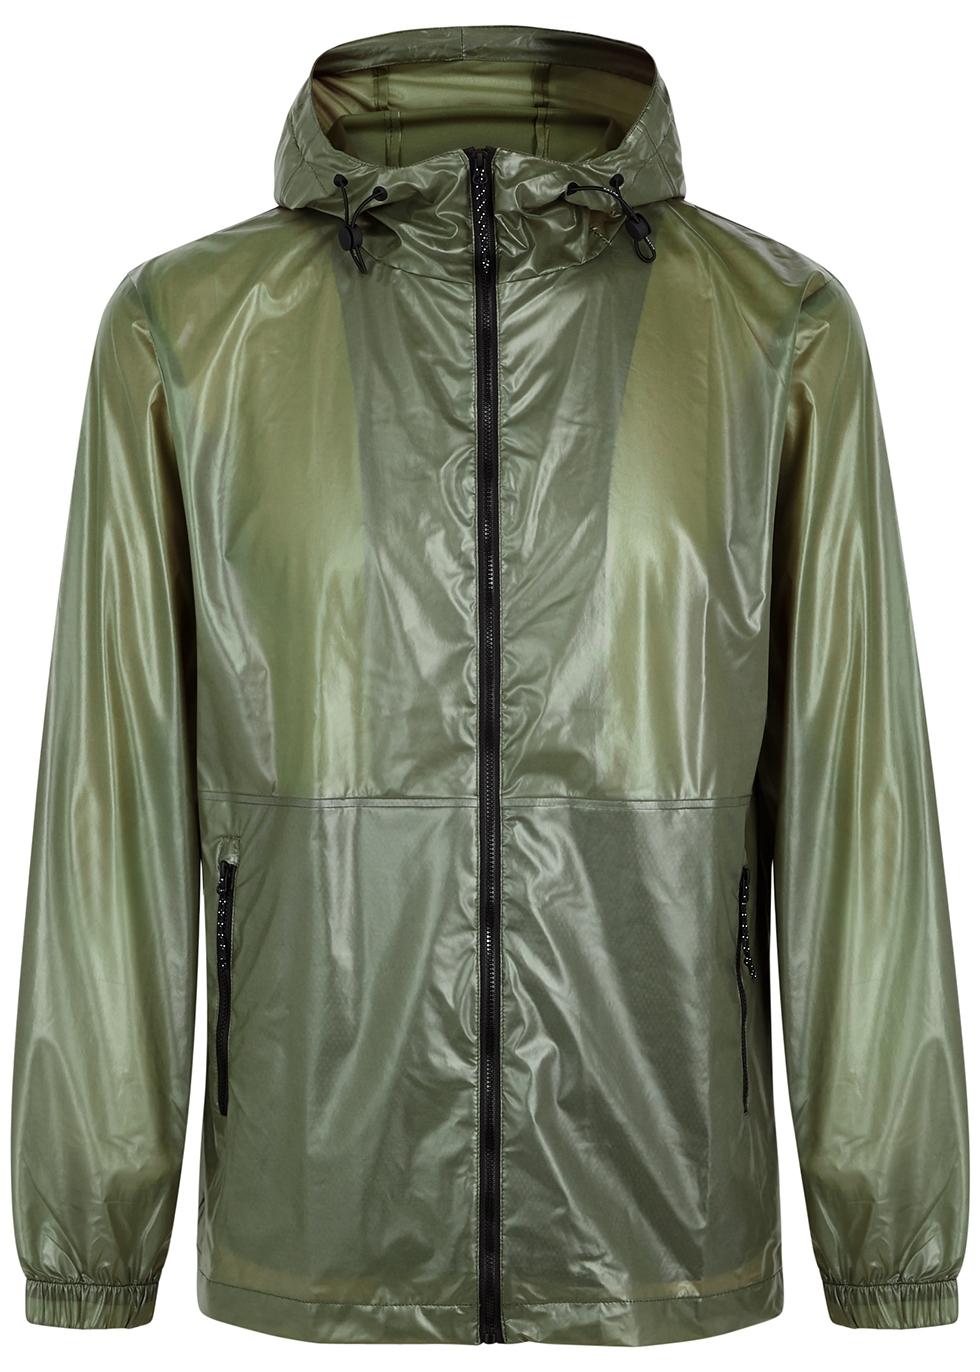 Ultralight olive shell jacket